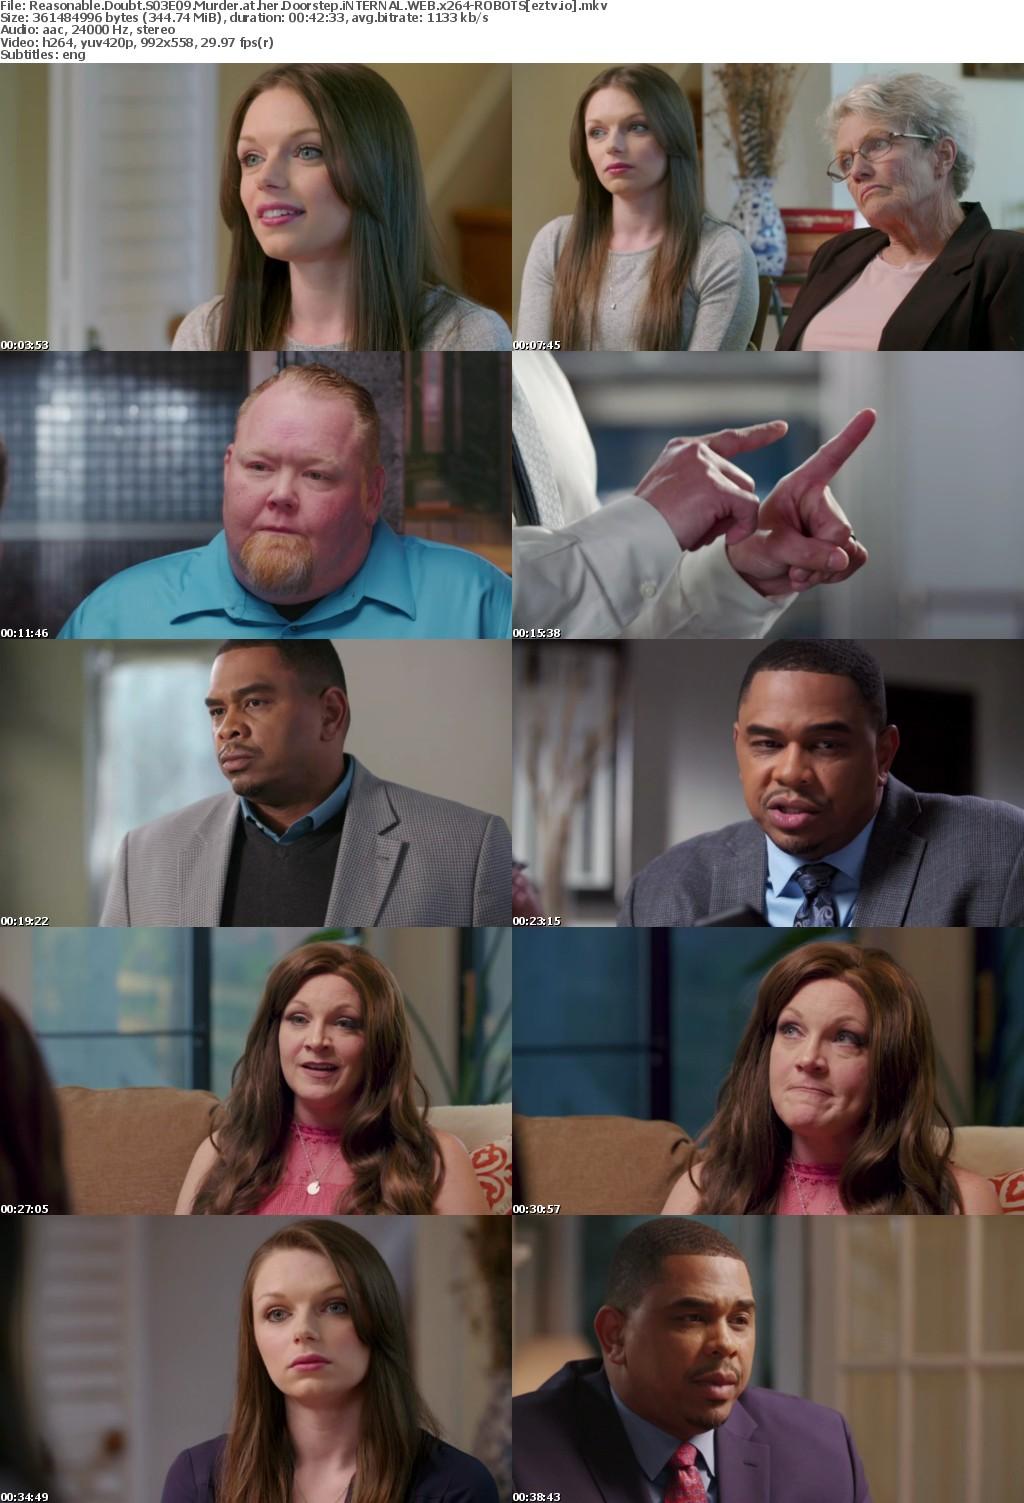 Reasonable Doubt S03E09 Murder at her Doorstep iNTERNAL WEB x264-ROBOTS